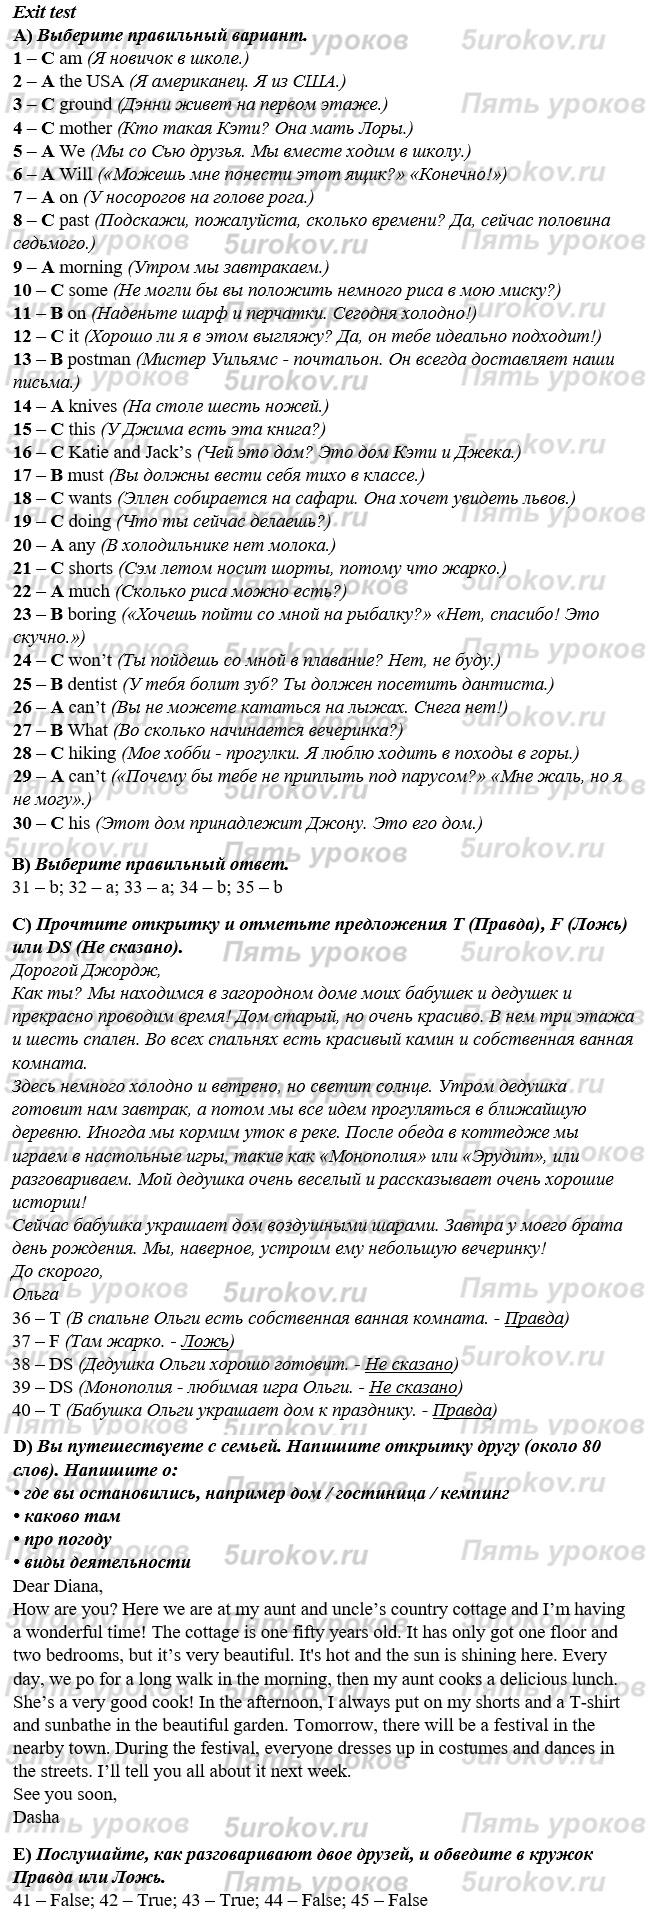 Спиши.ру spotlight 7 класс